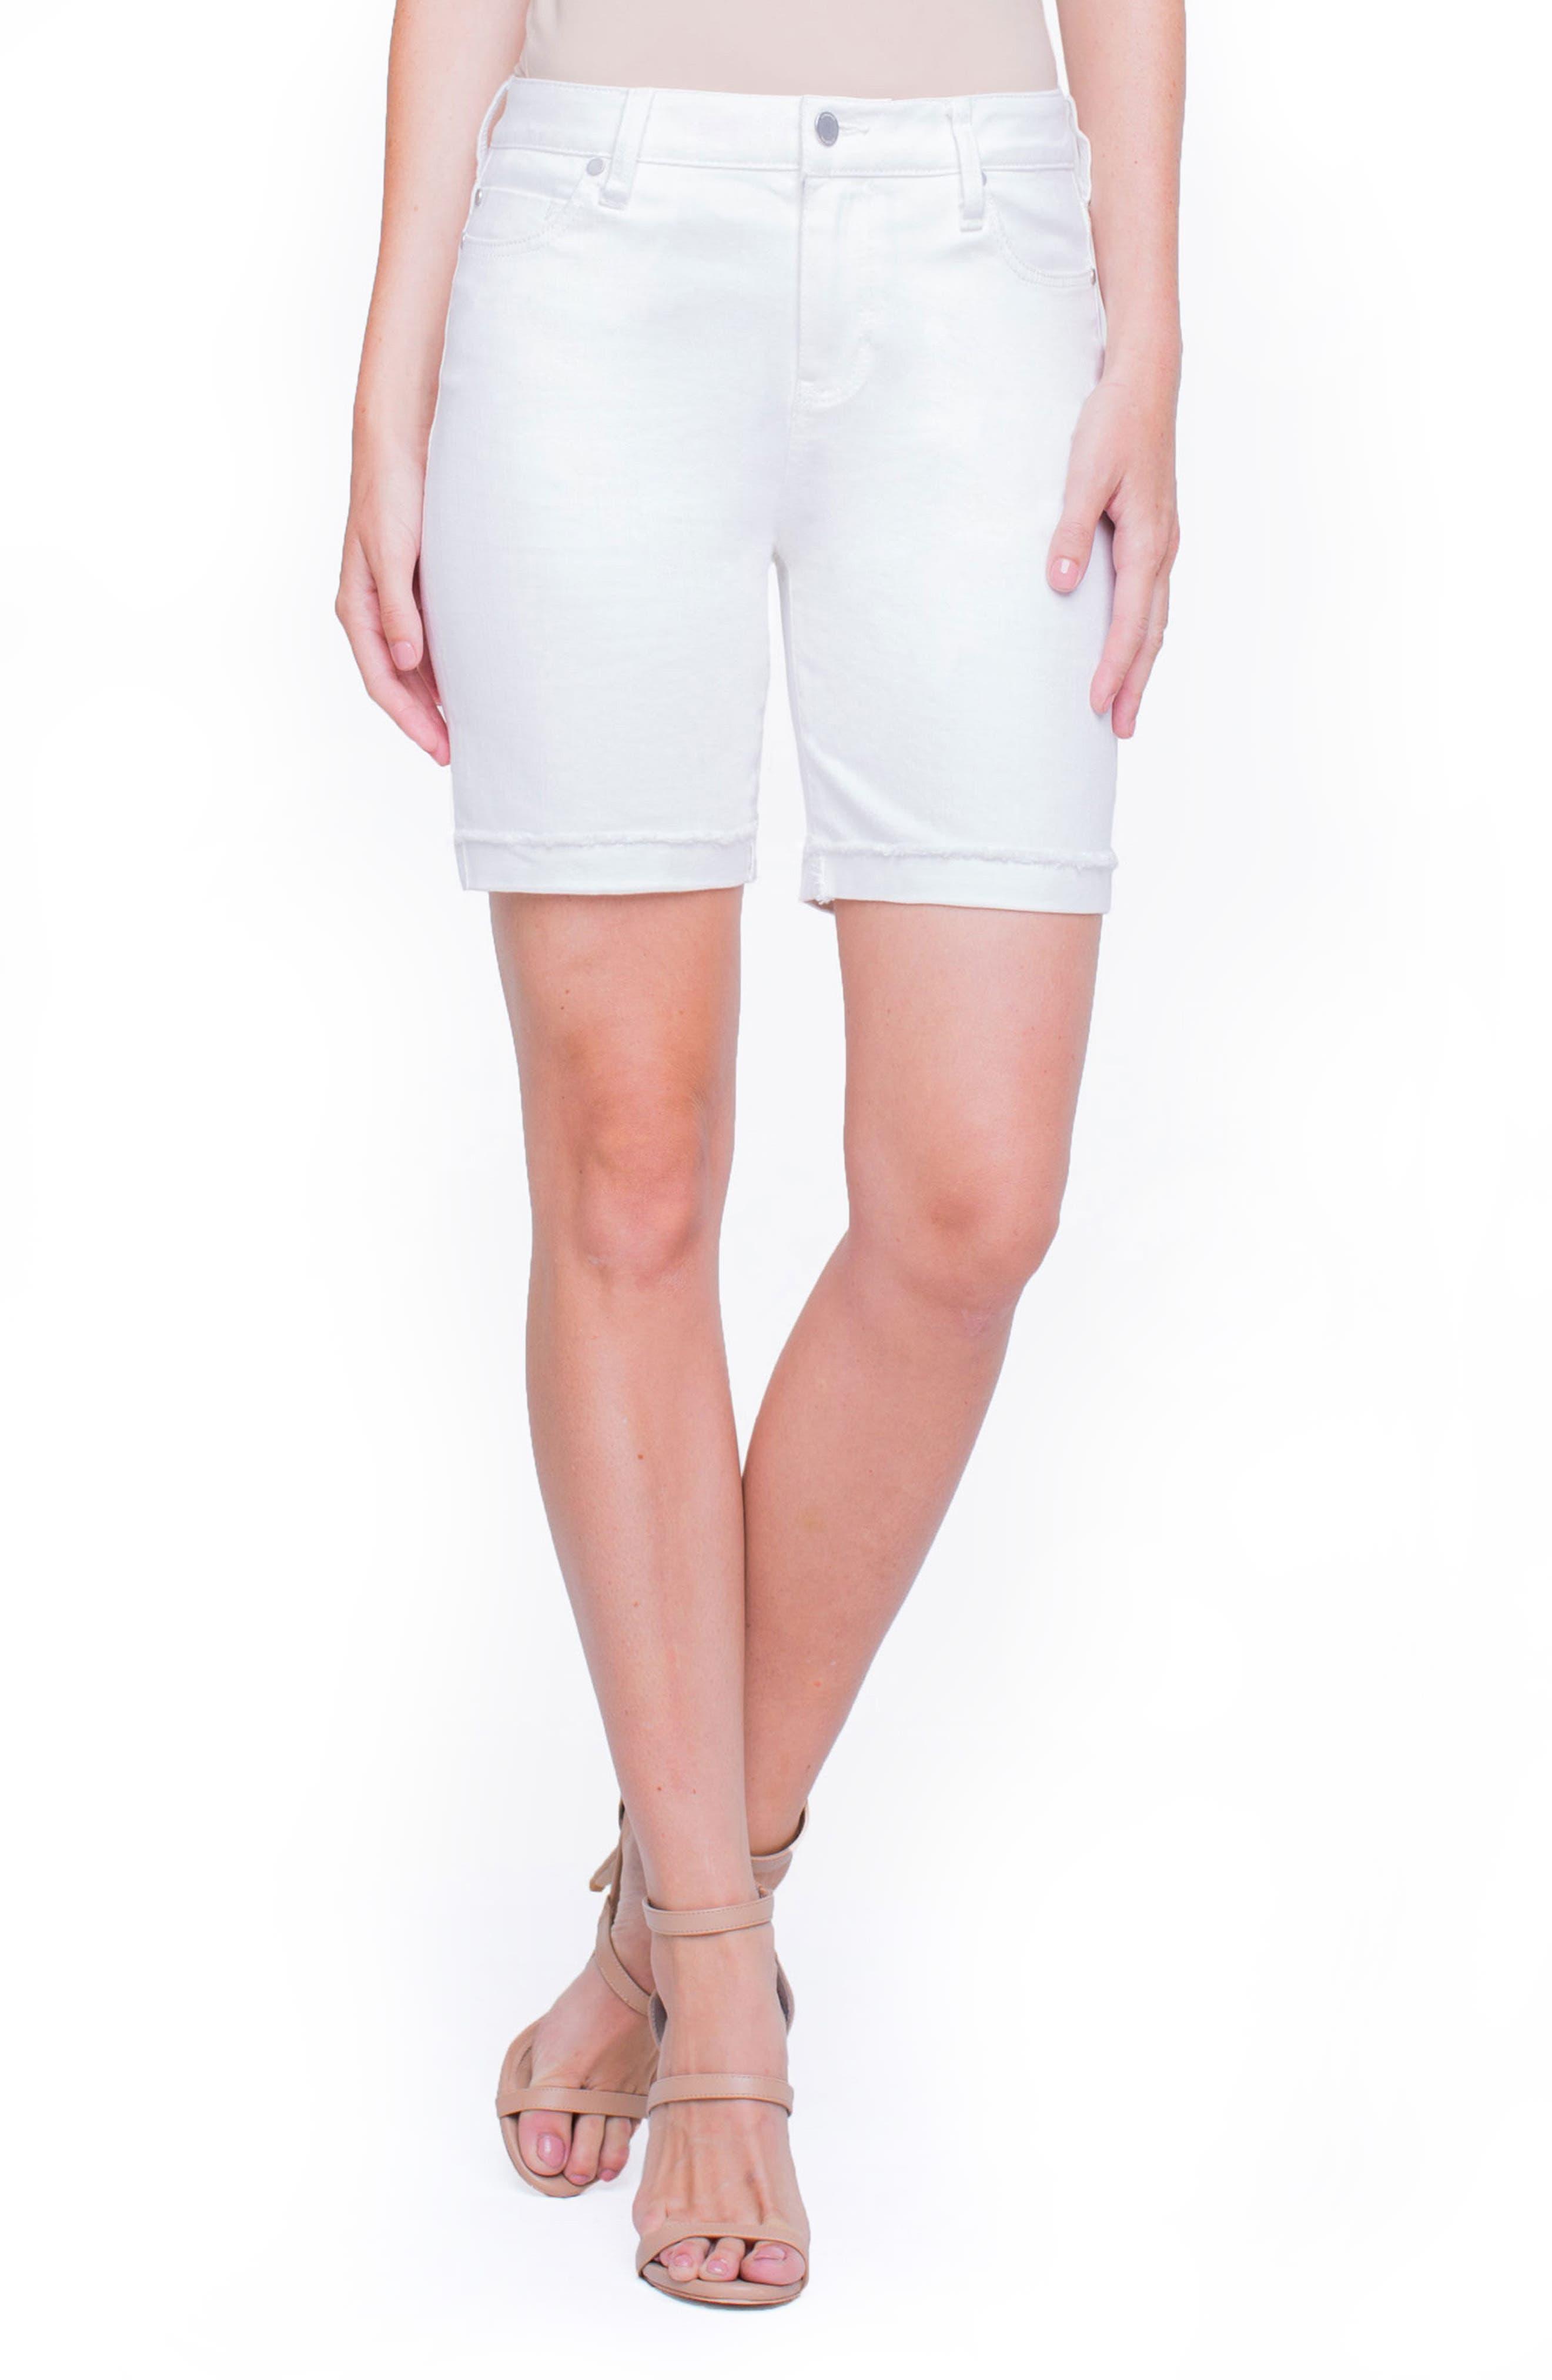 Casey White Denim Shorts,                         Main,                         color, 105